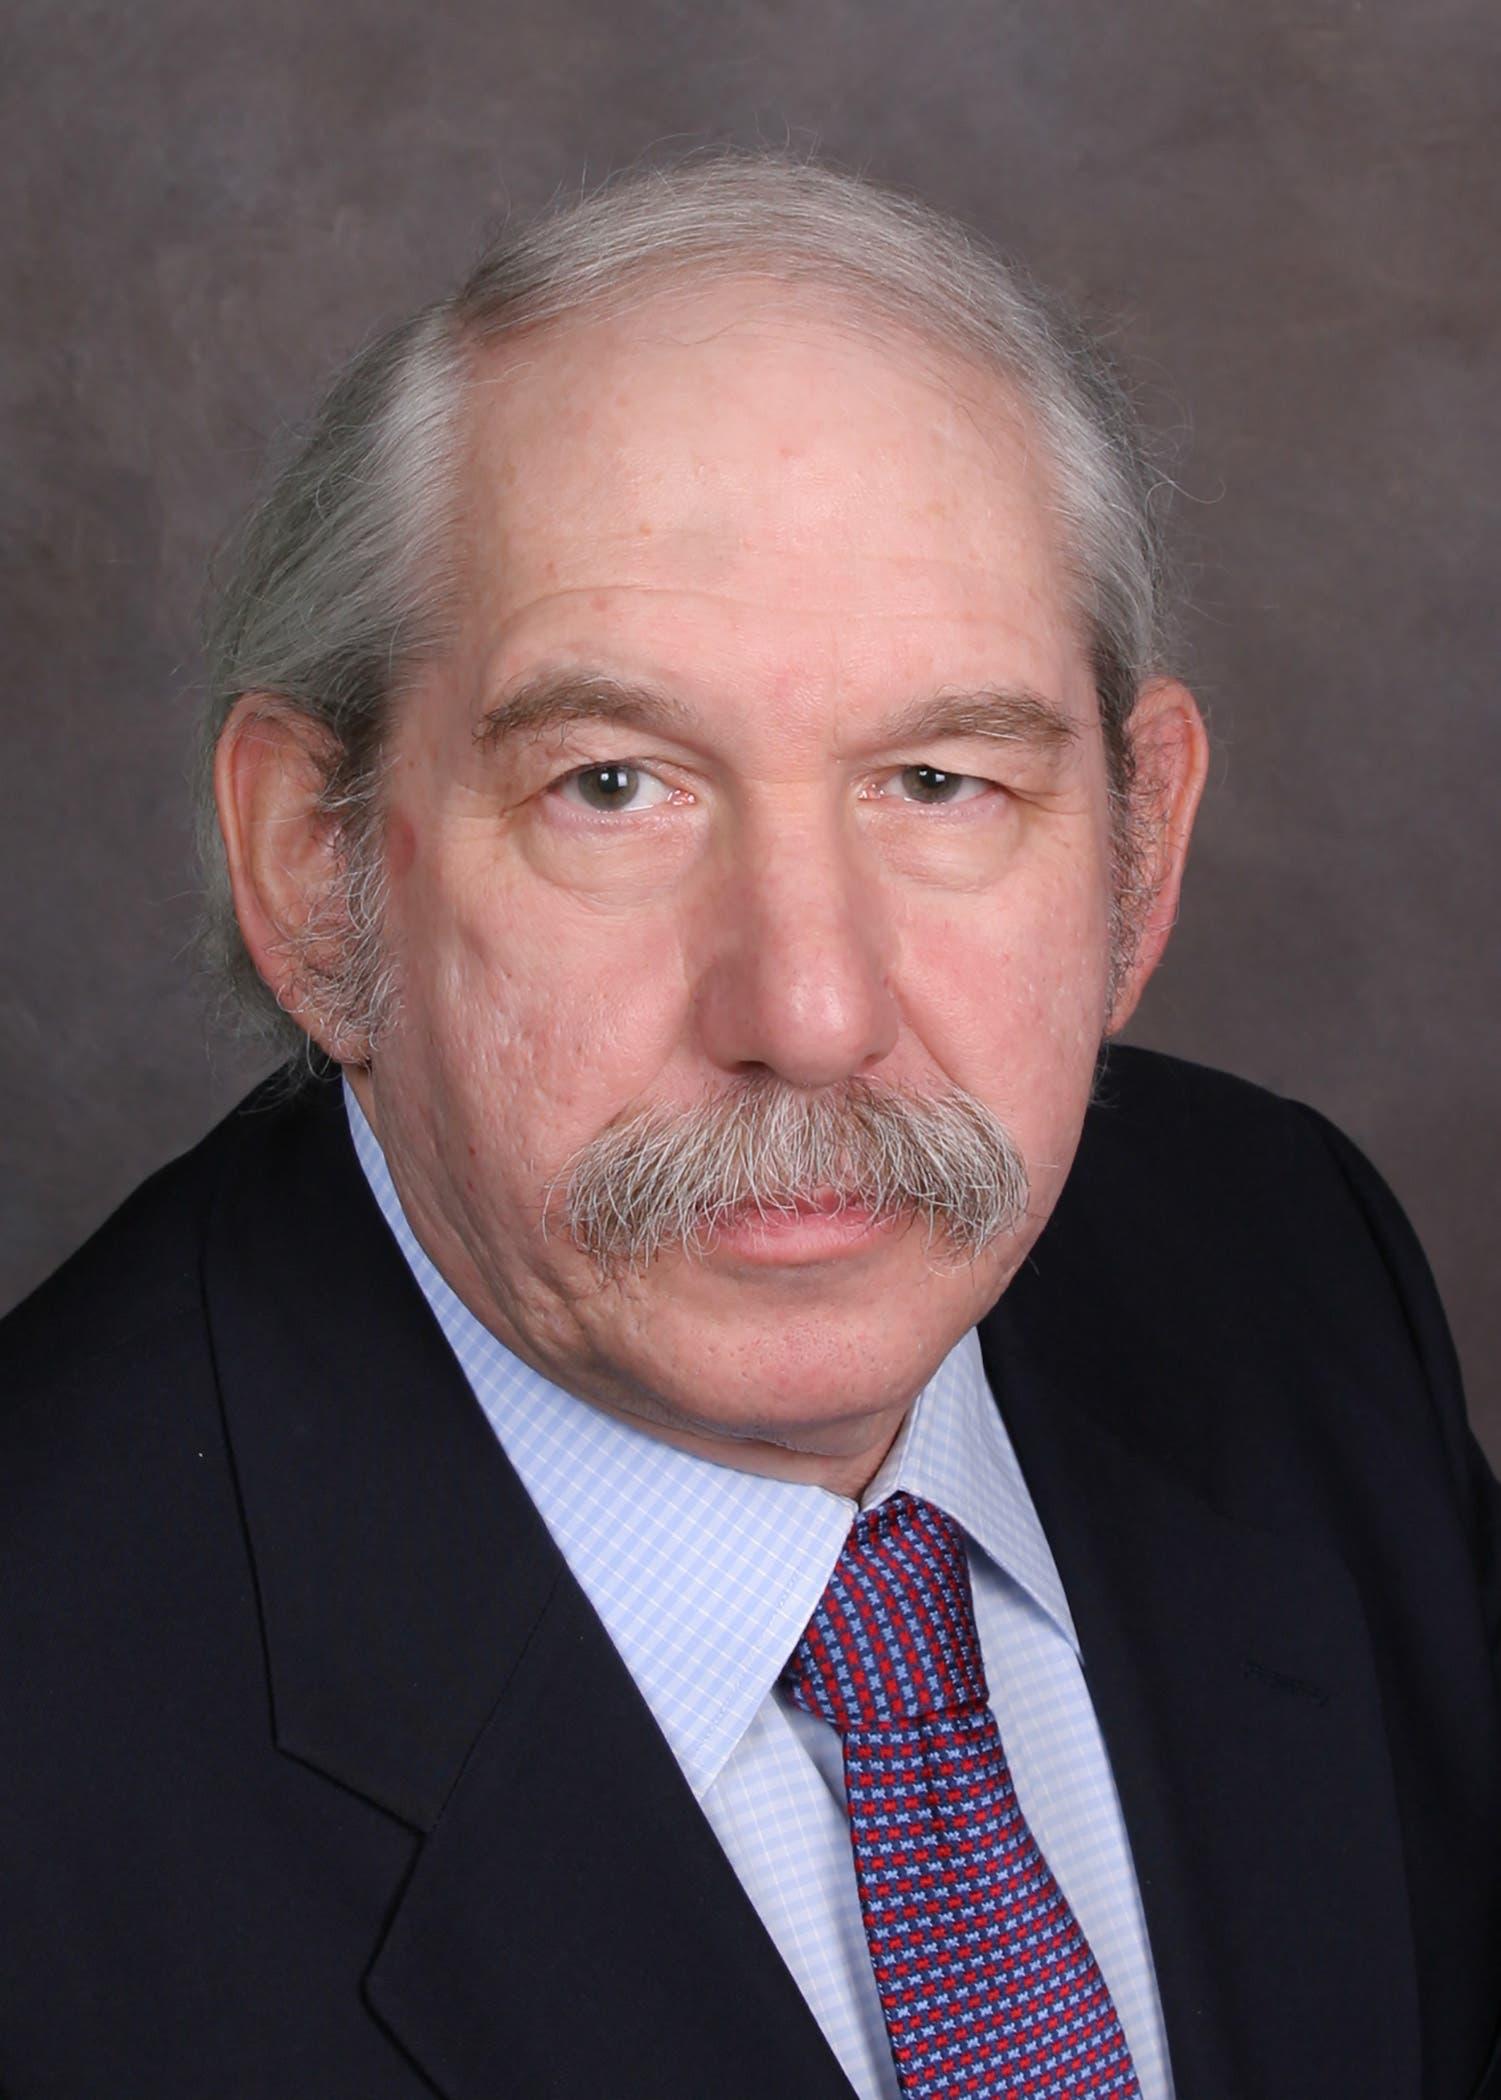 Dr  William Oppenheim Joins Barnabas Health Medical Group